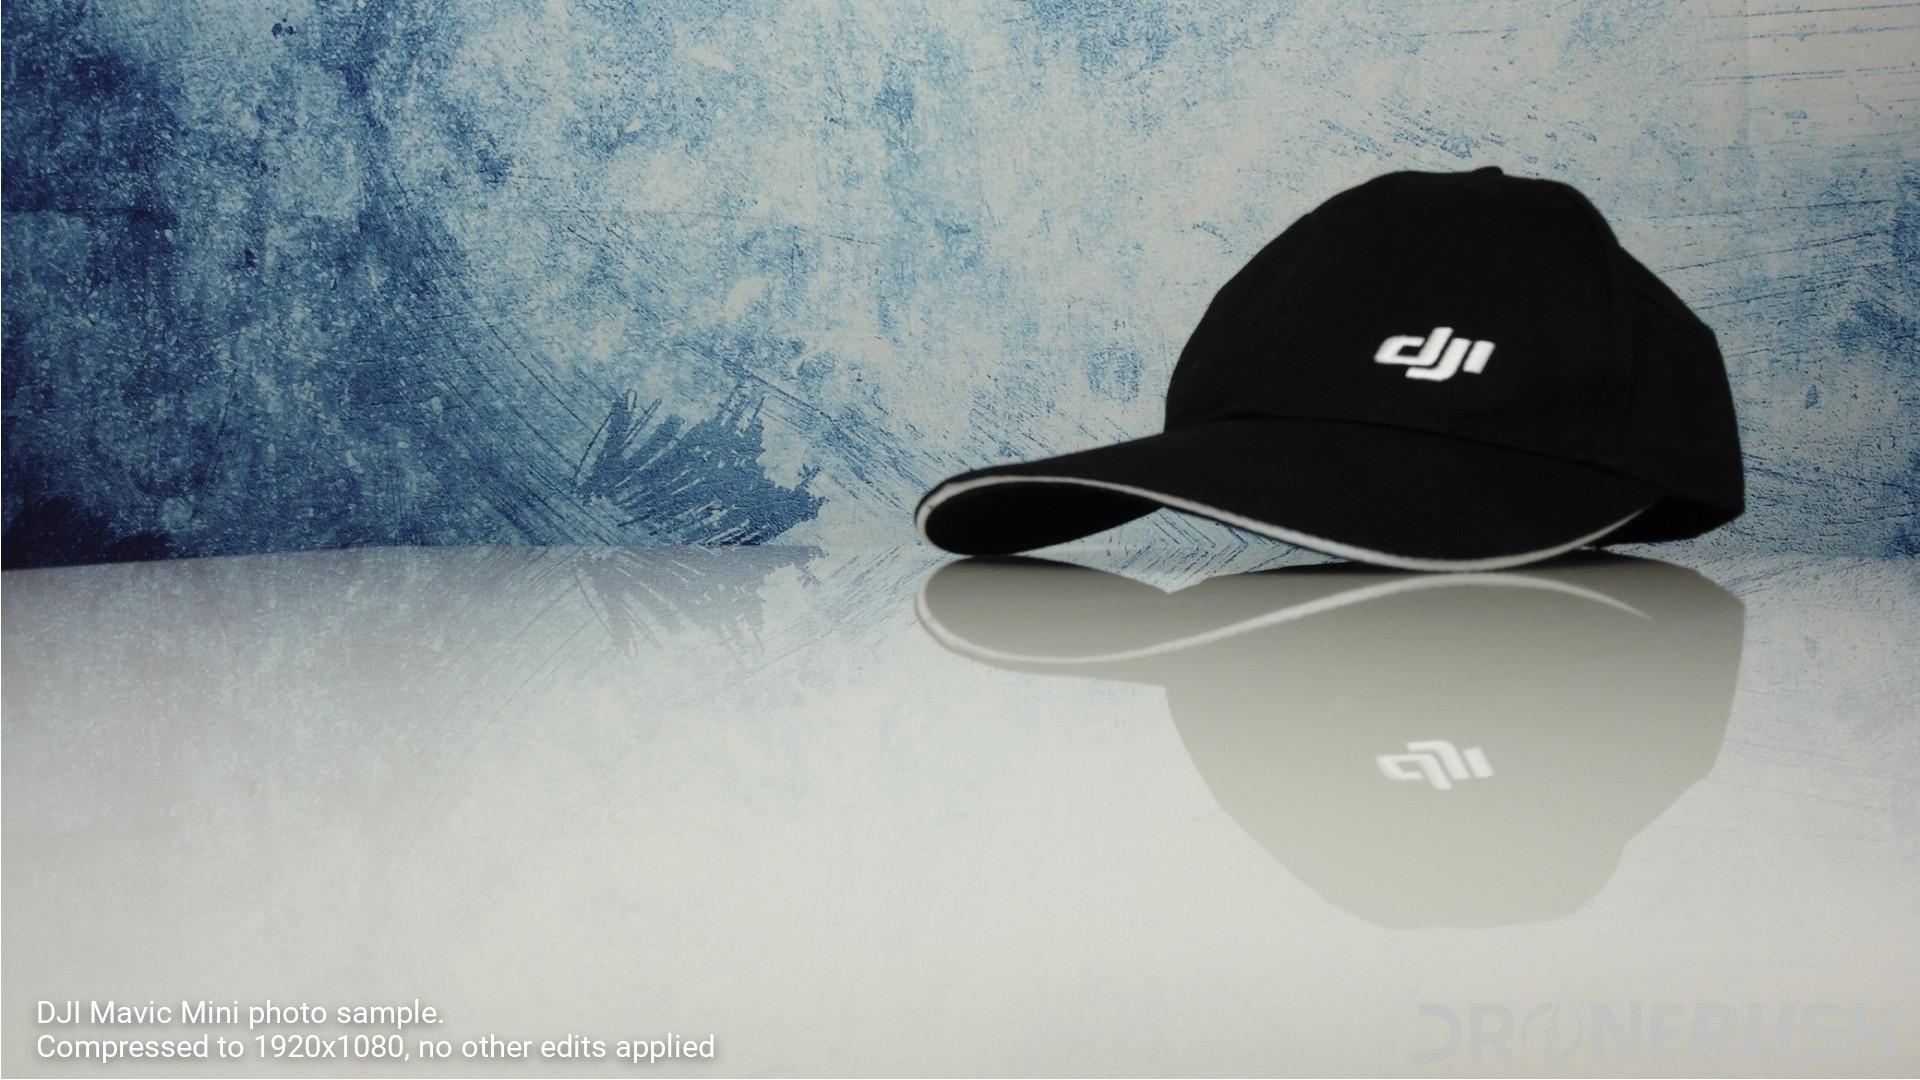 DJI Mavic Mini photo sample indoors hat